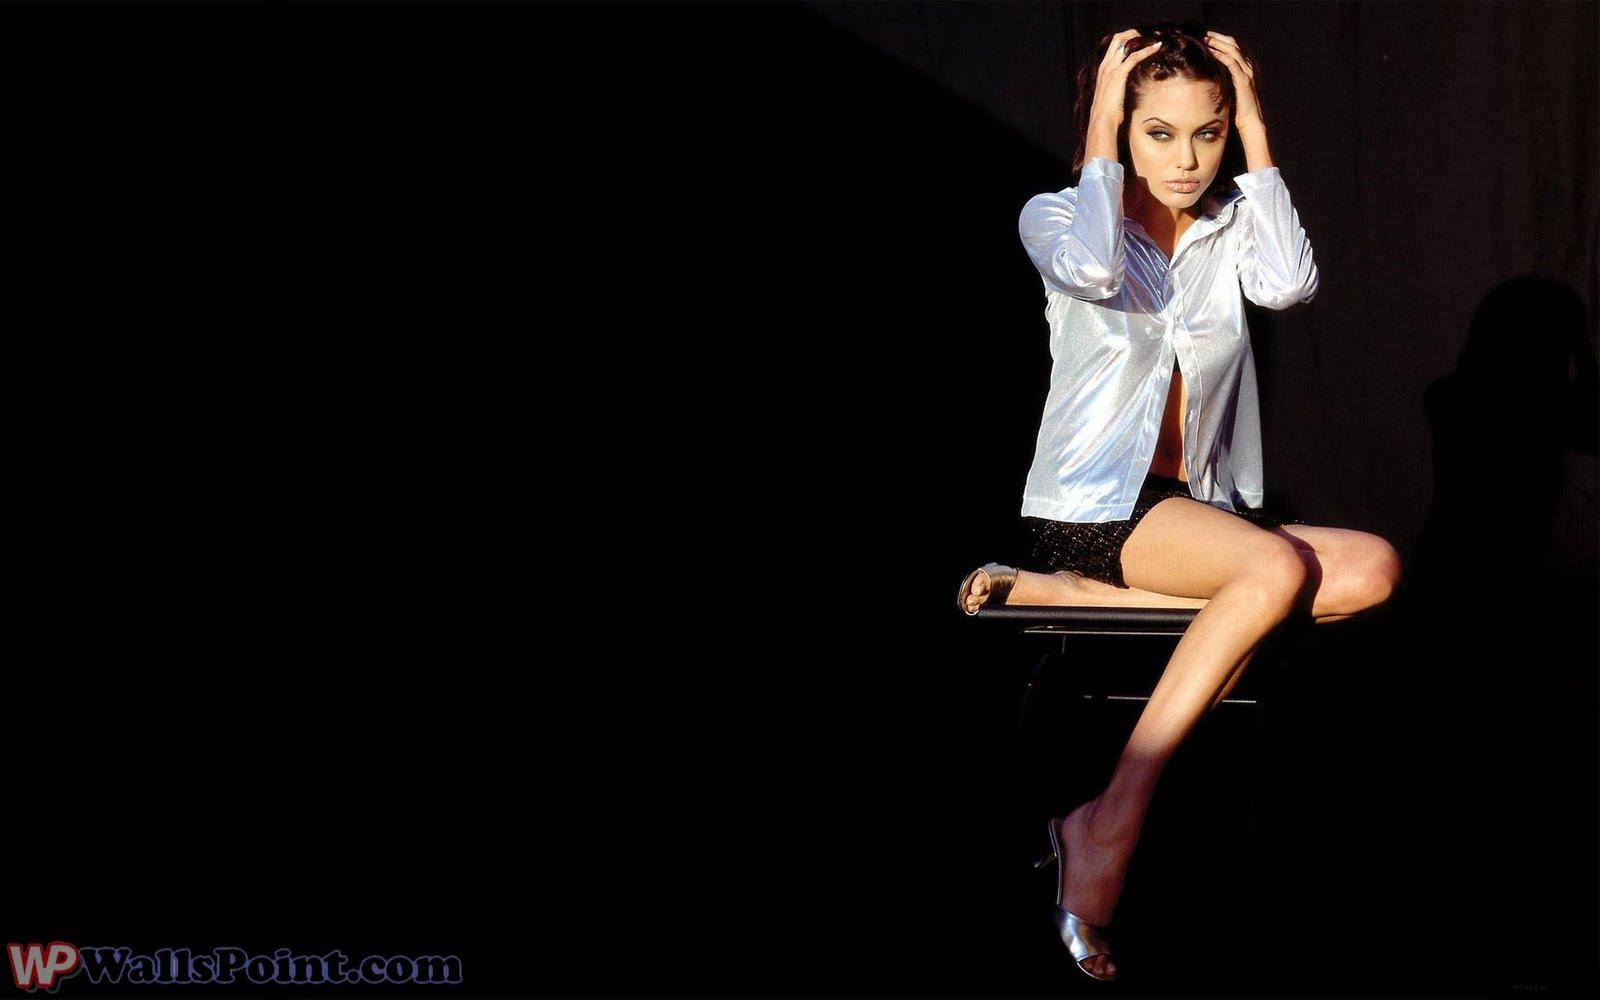 http://3.bp.blogspot.com/_jv3QsJvYDs8/TBy7AhXaunI/AAAAAAAAAlE/OzuEt6HkF_I/s1600/Angelina_Jolie++++++++++++++wallspoint.com+(8).jpg